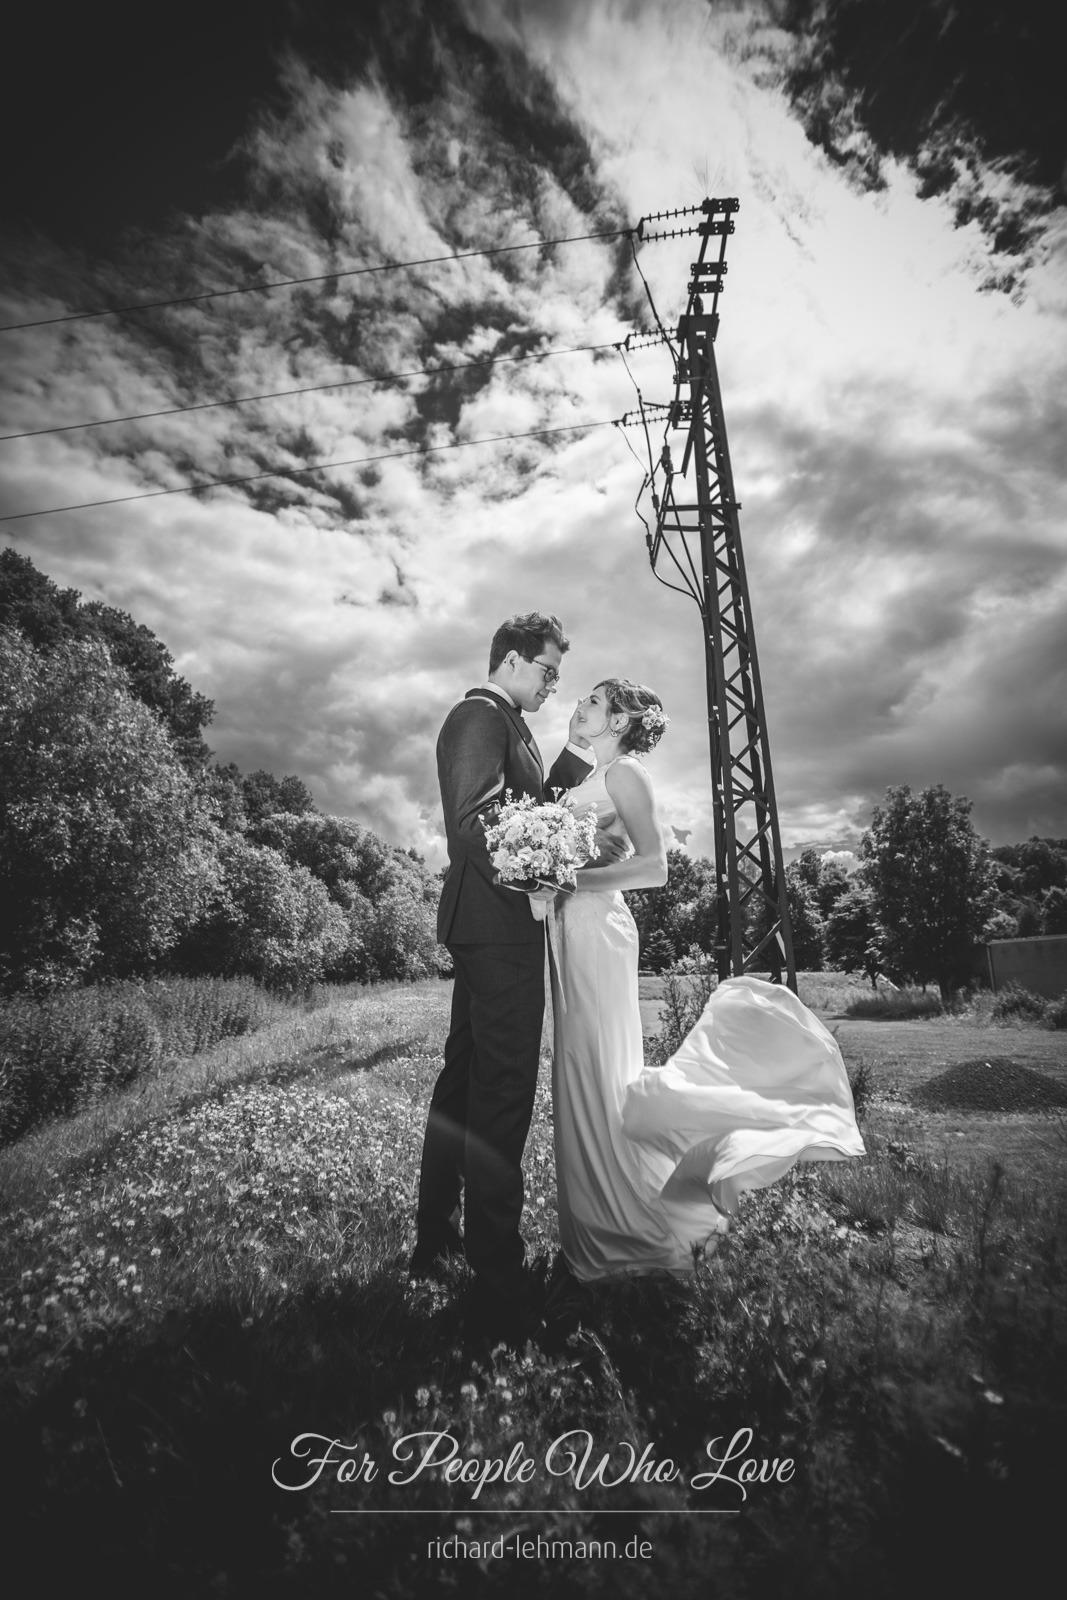 Hochzeitsfotograf-Richard-Lehmann-7998